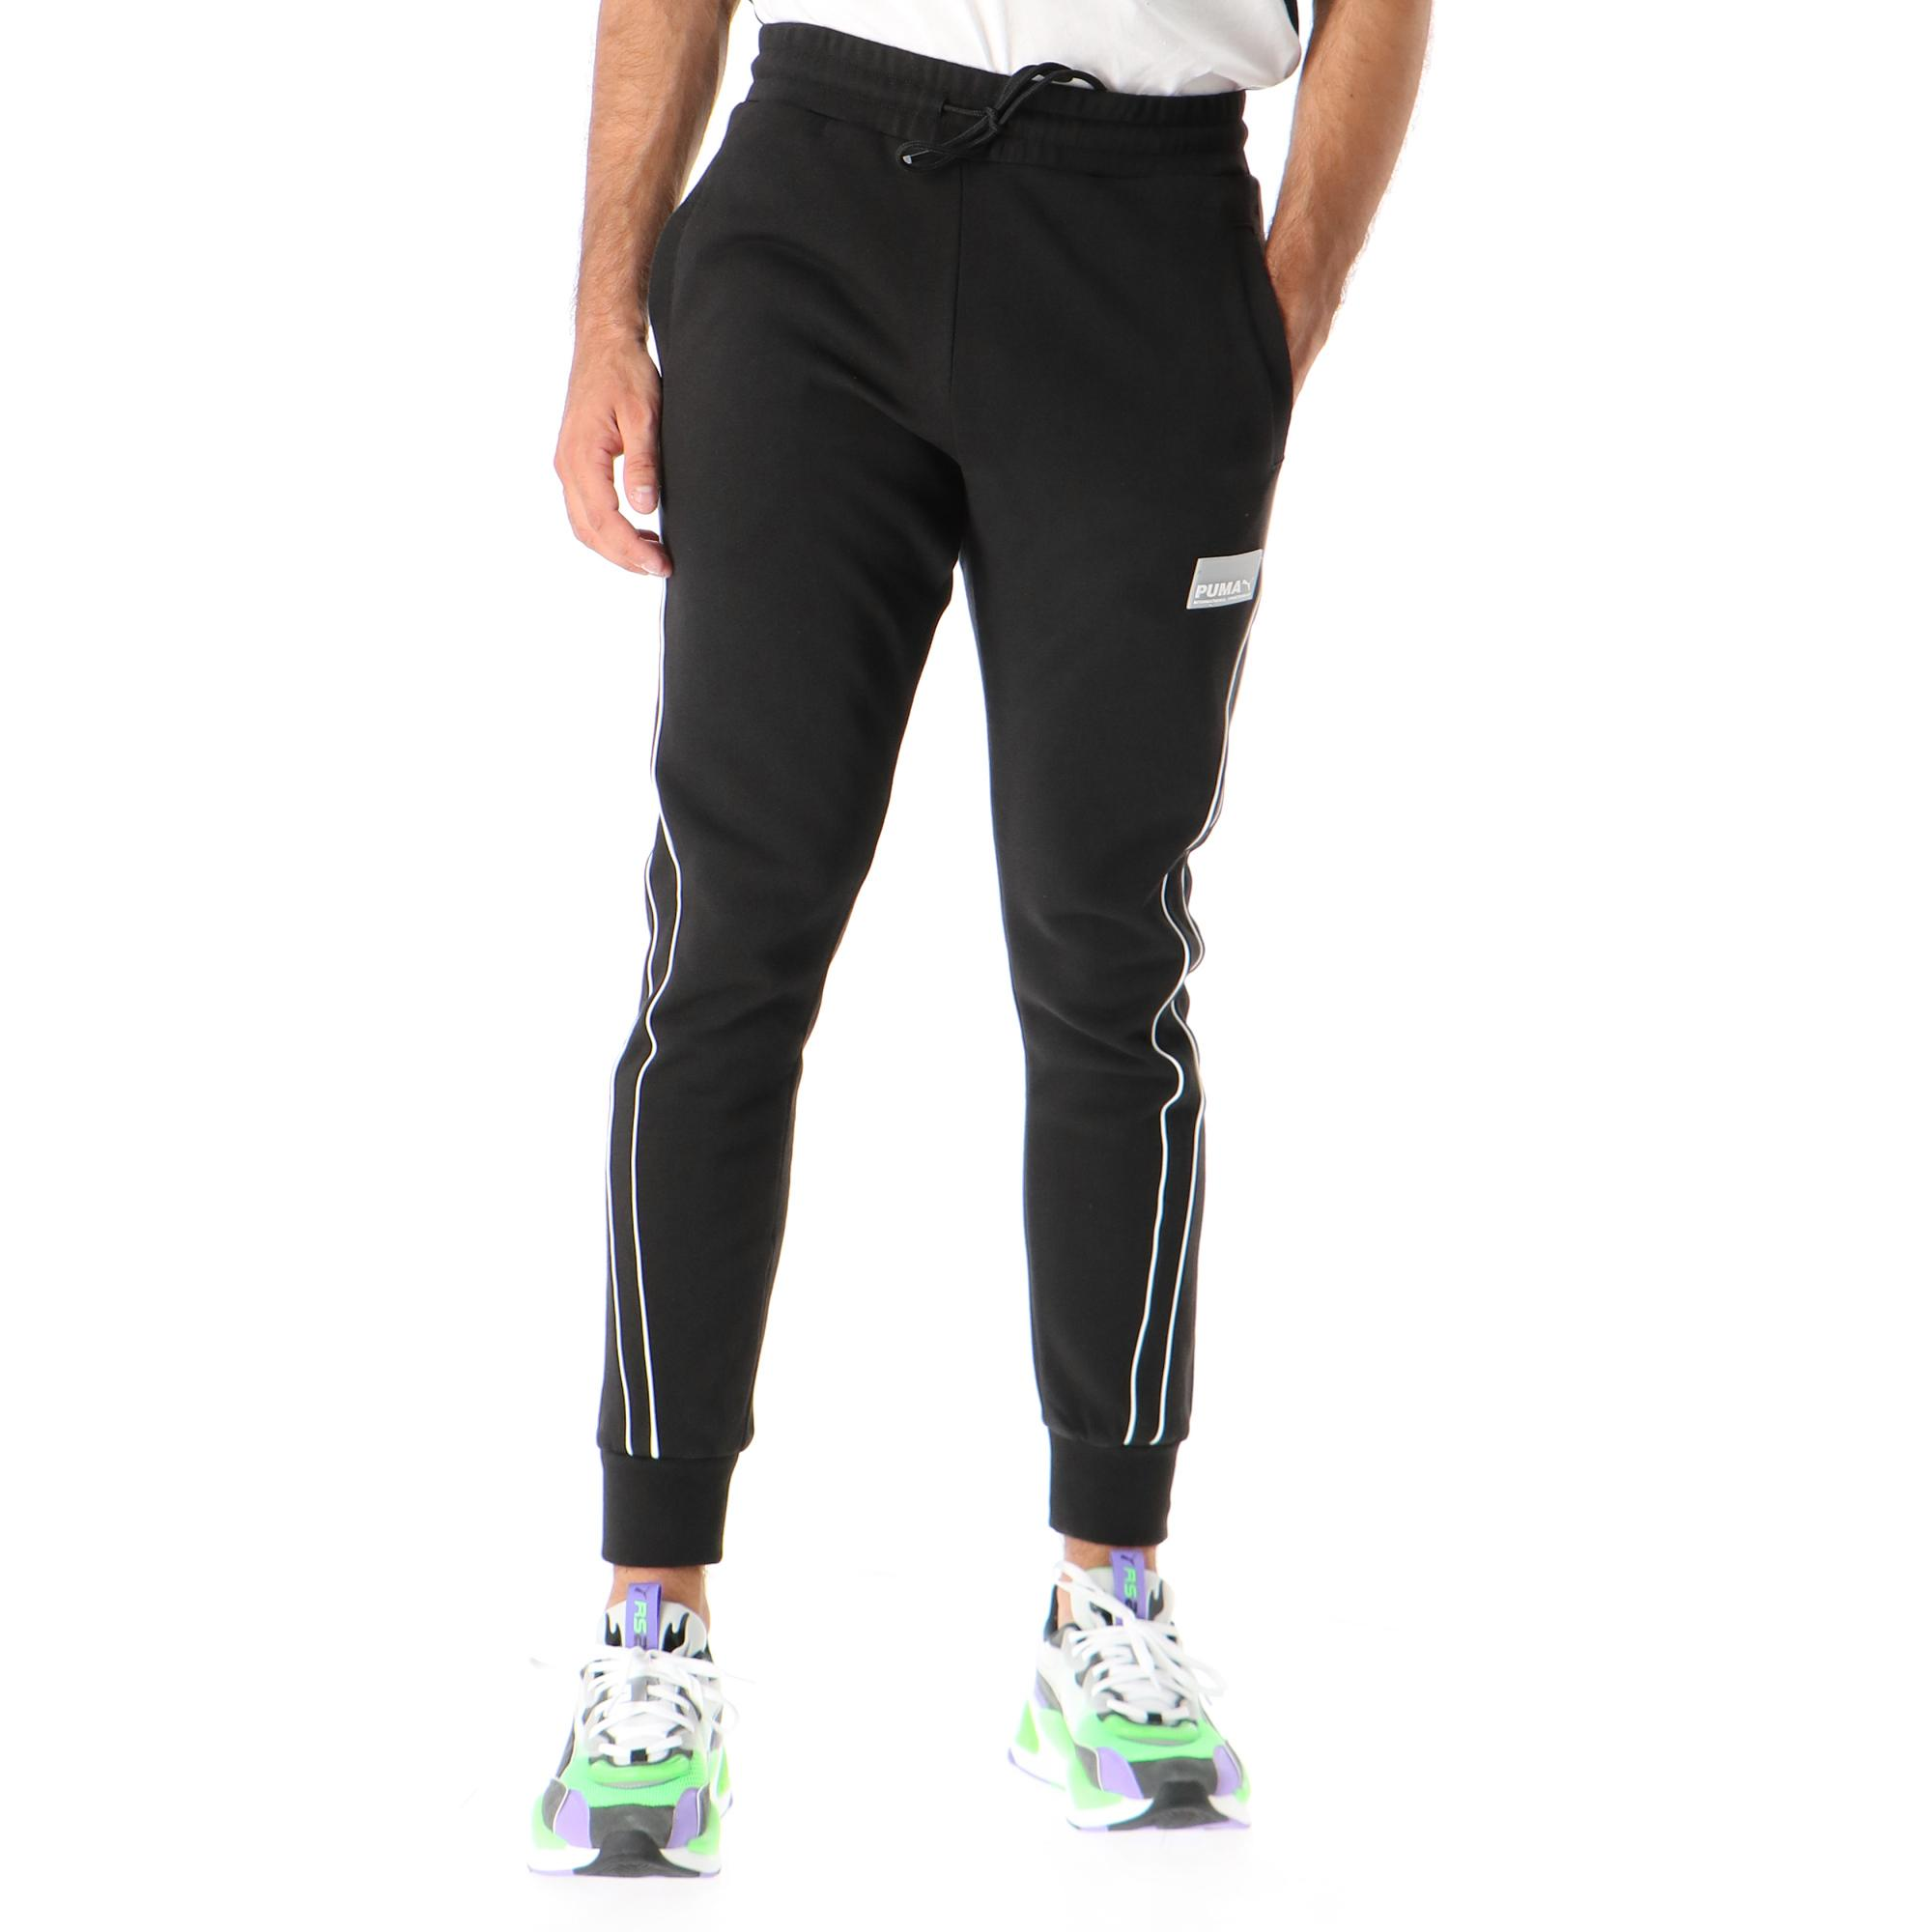 Puma Avenir Track Pants Ft Puma black